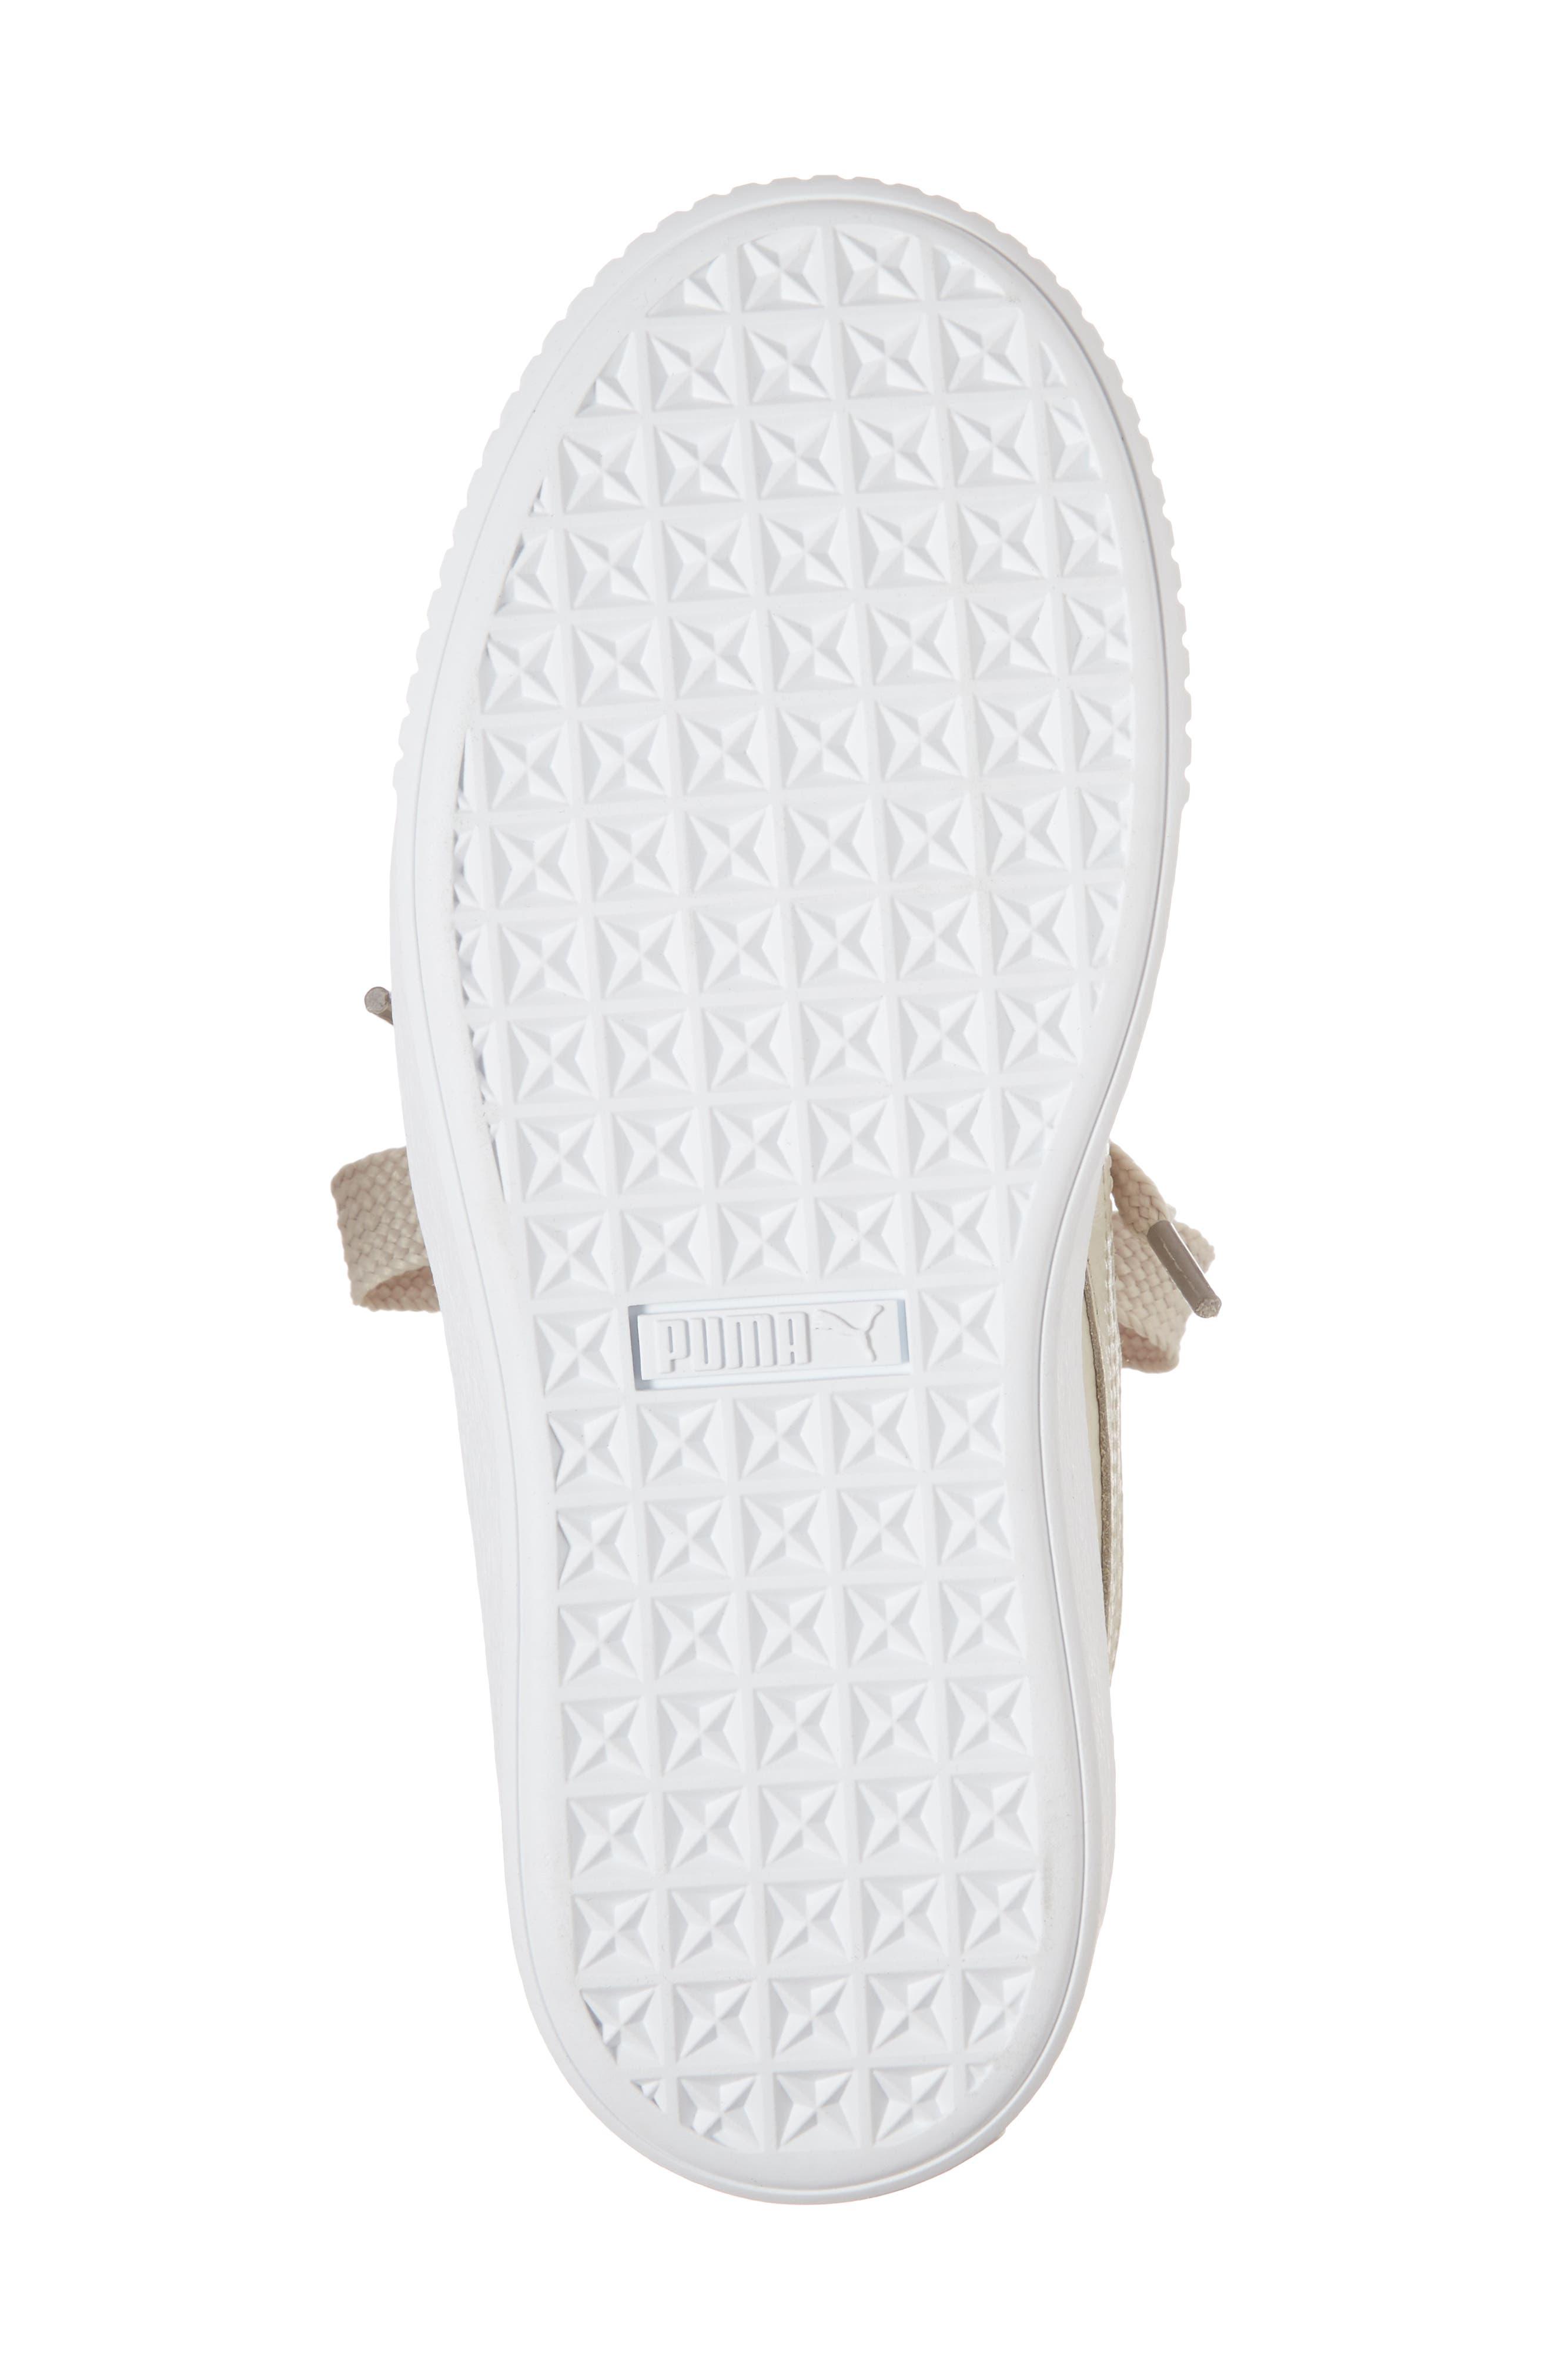 Platform Kiss Sneaker,                             Alternate thumbnail 6, color,                             Ivory